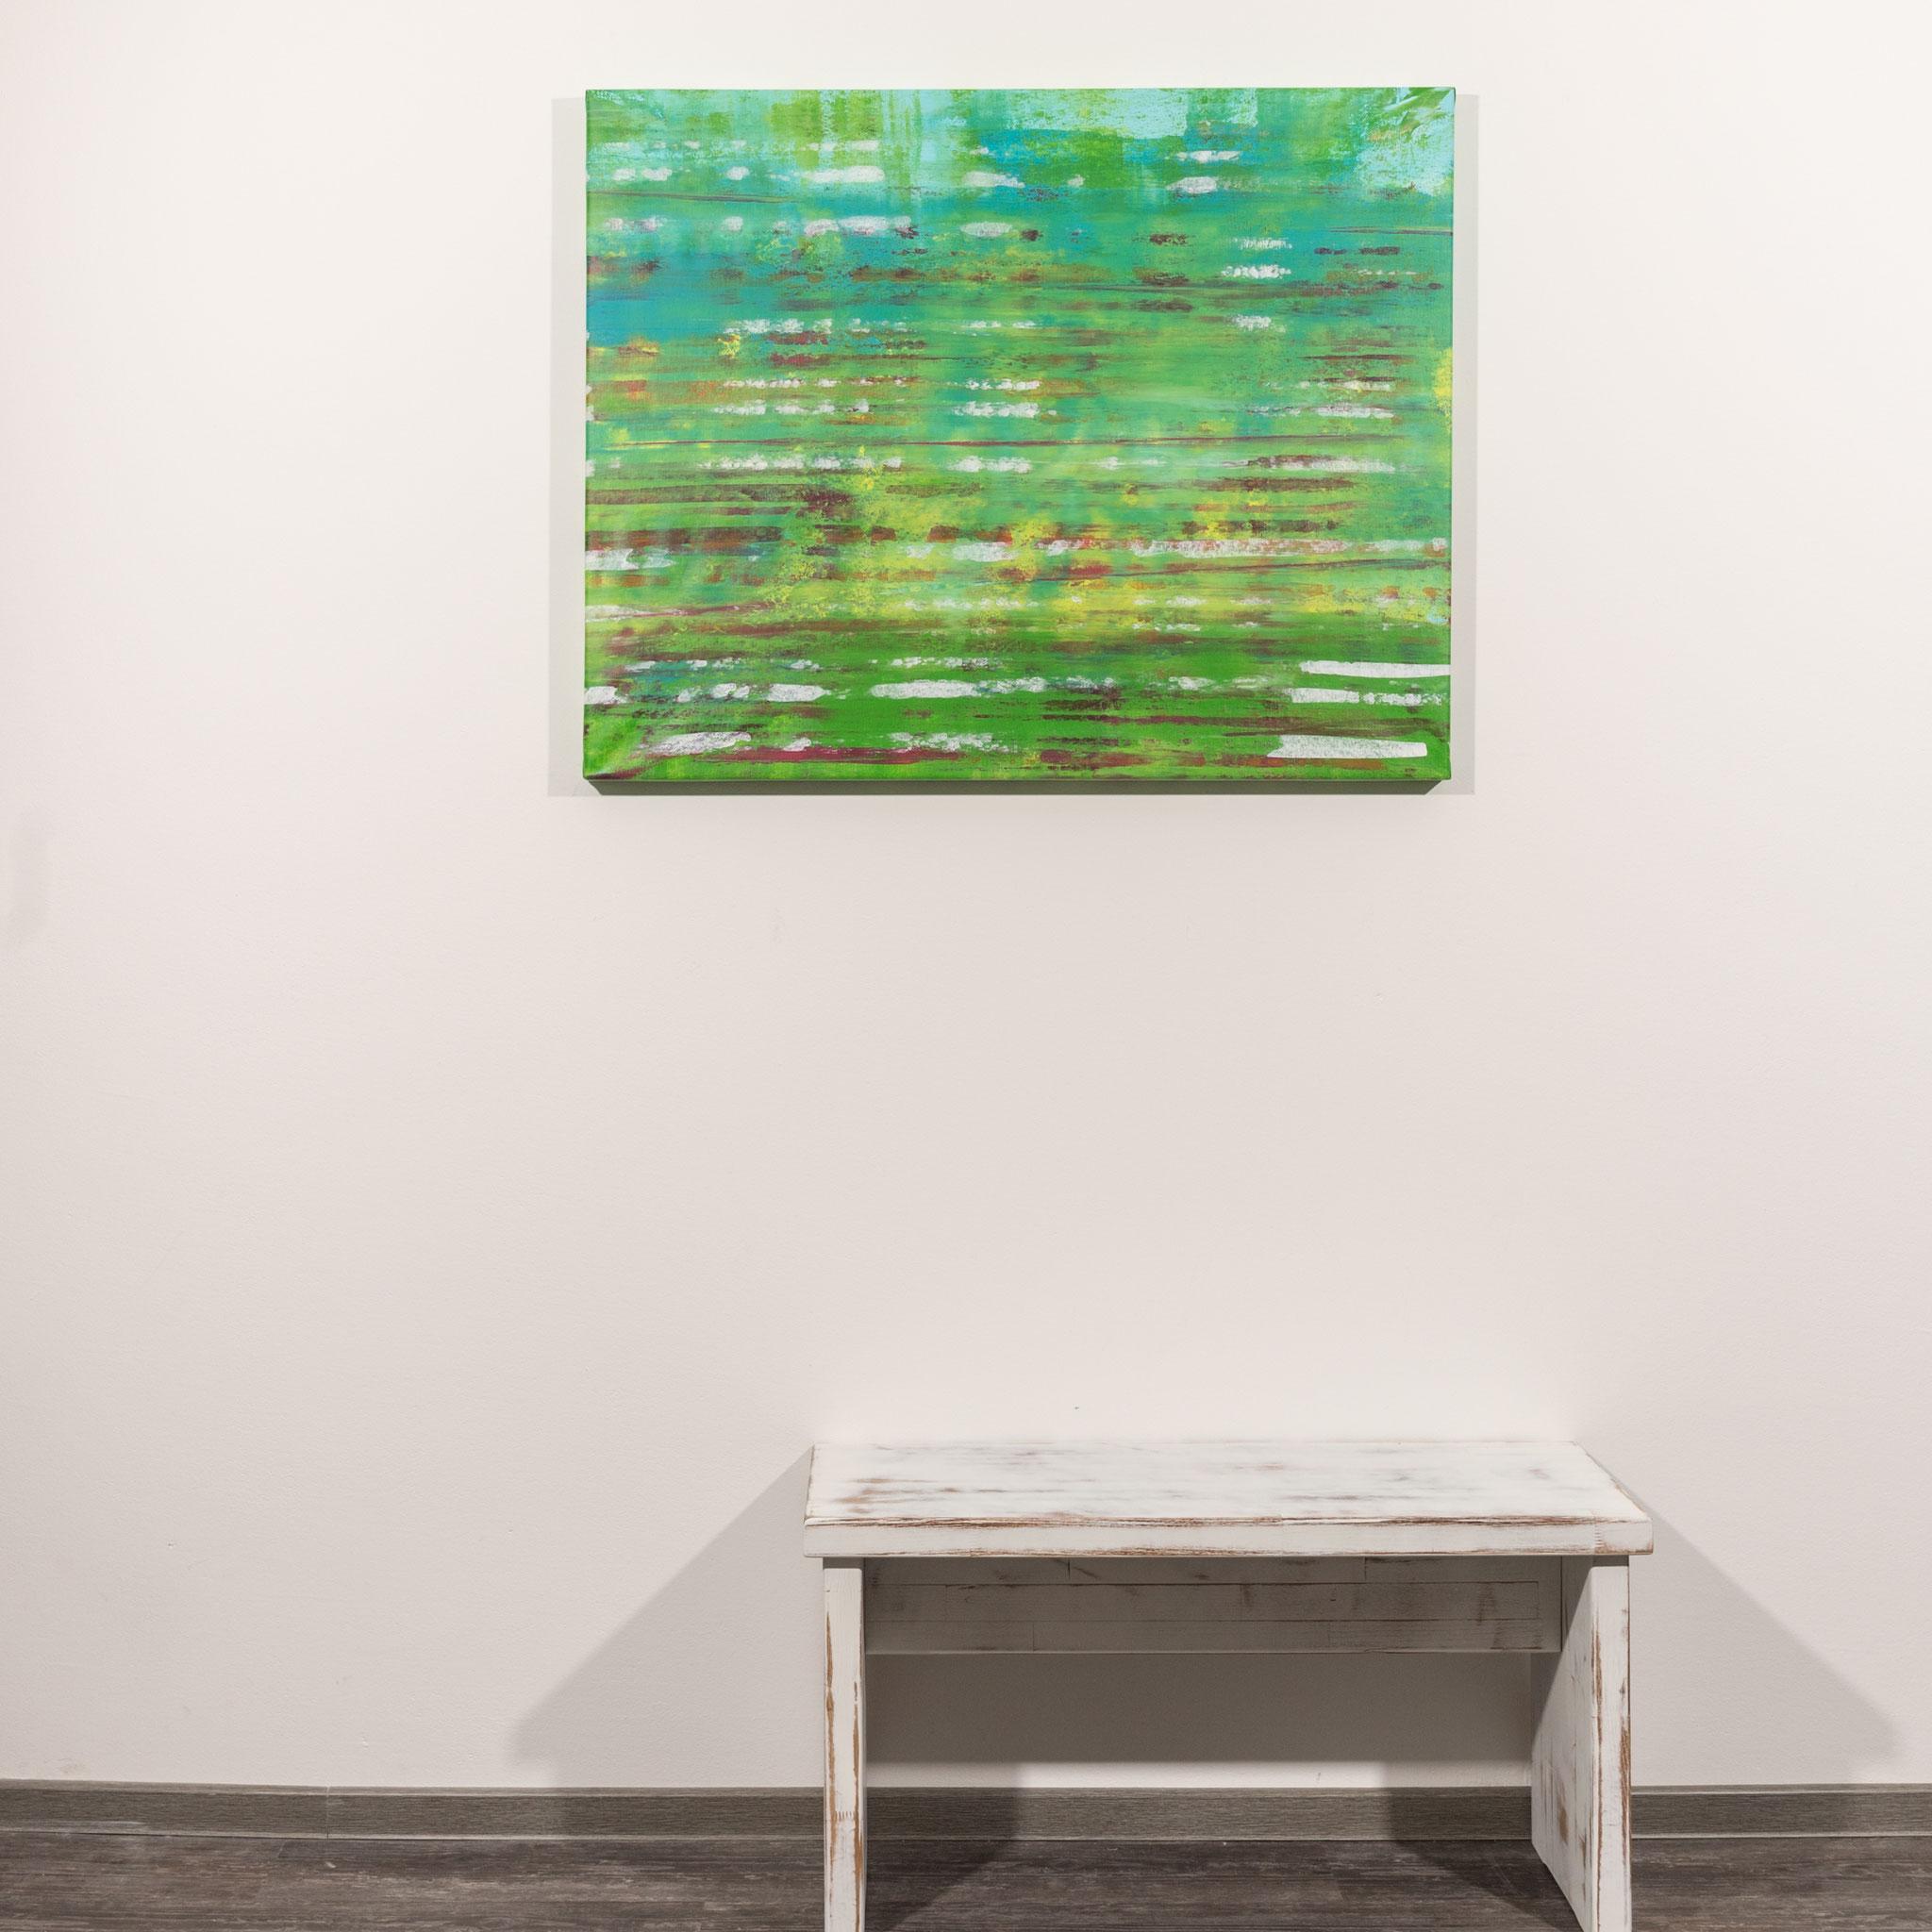 # 88 Frühlingswiese ´21                   80 x 100cm